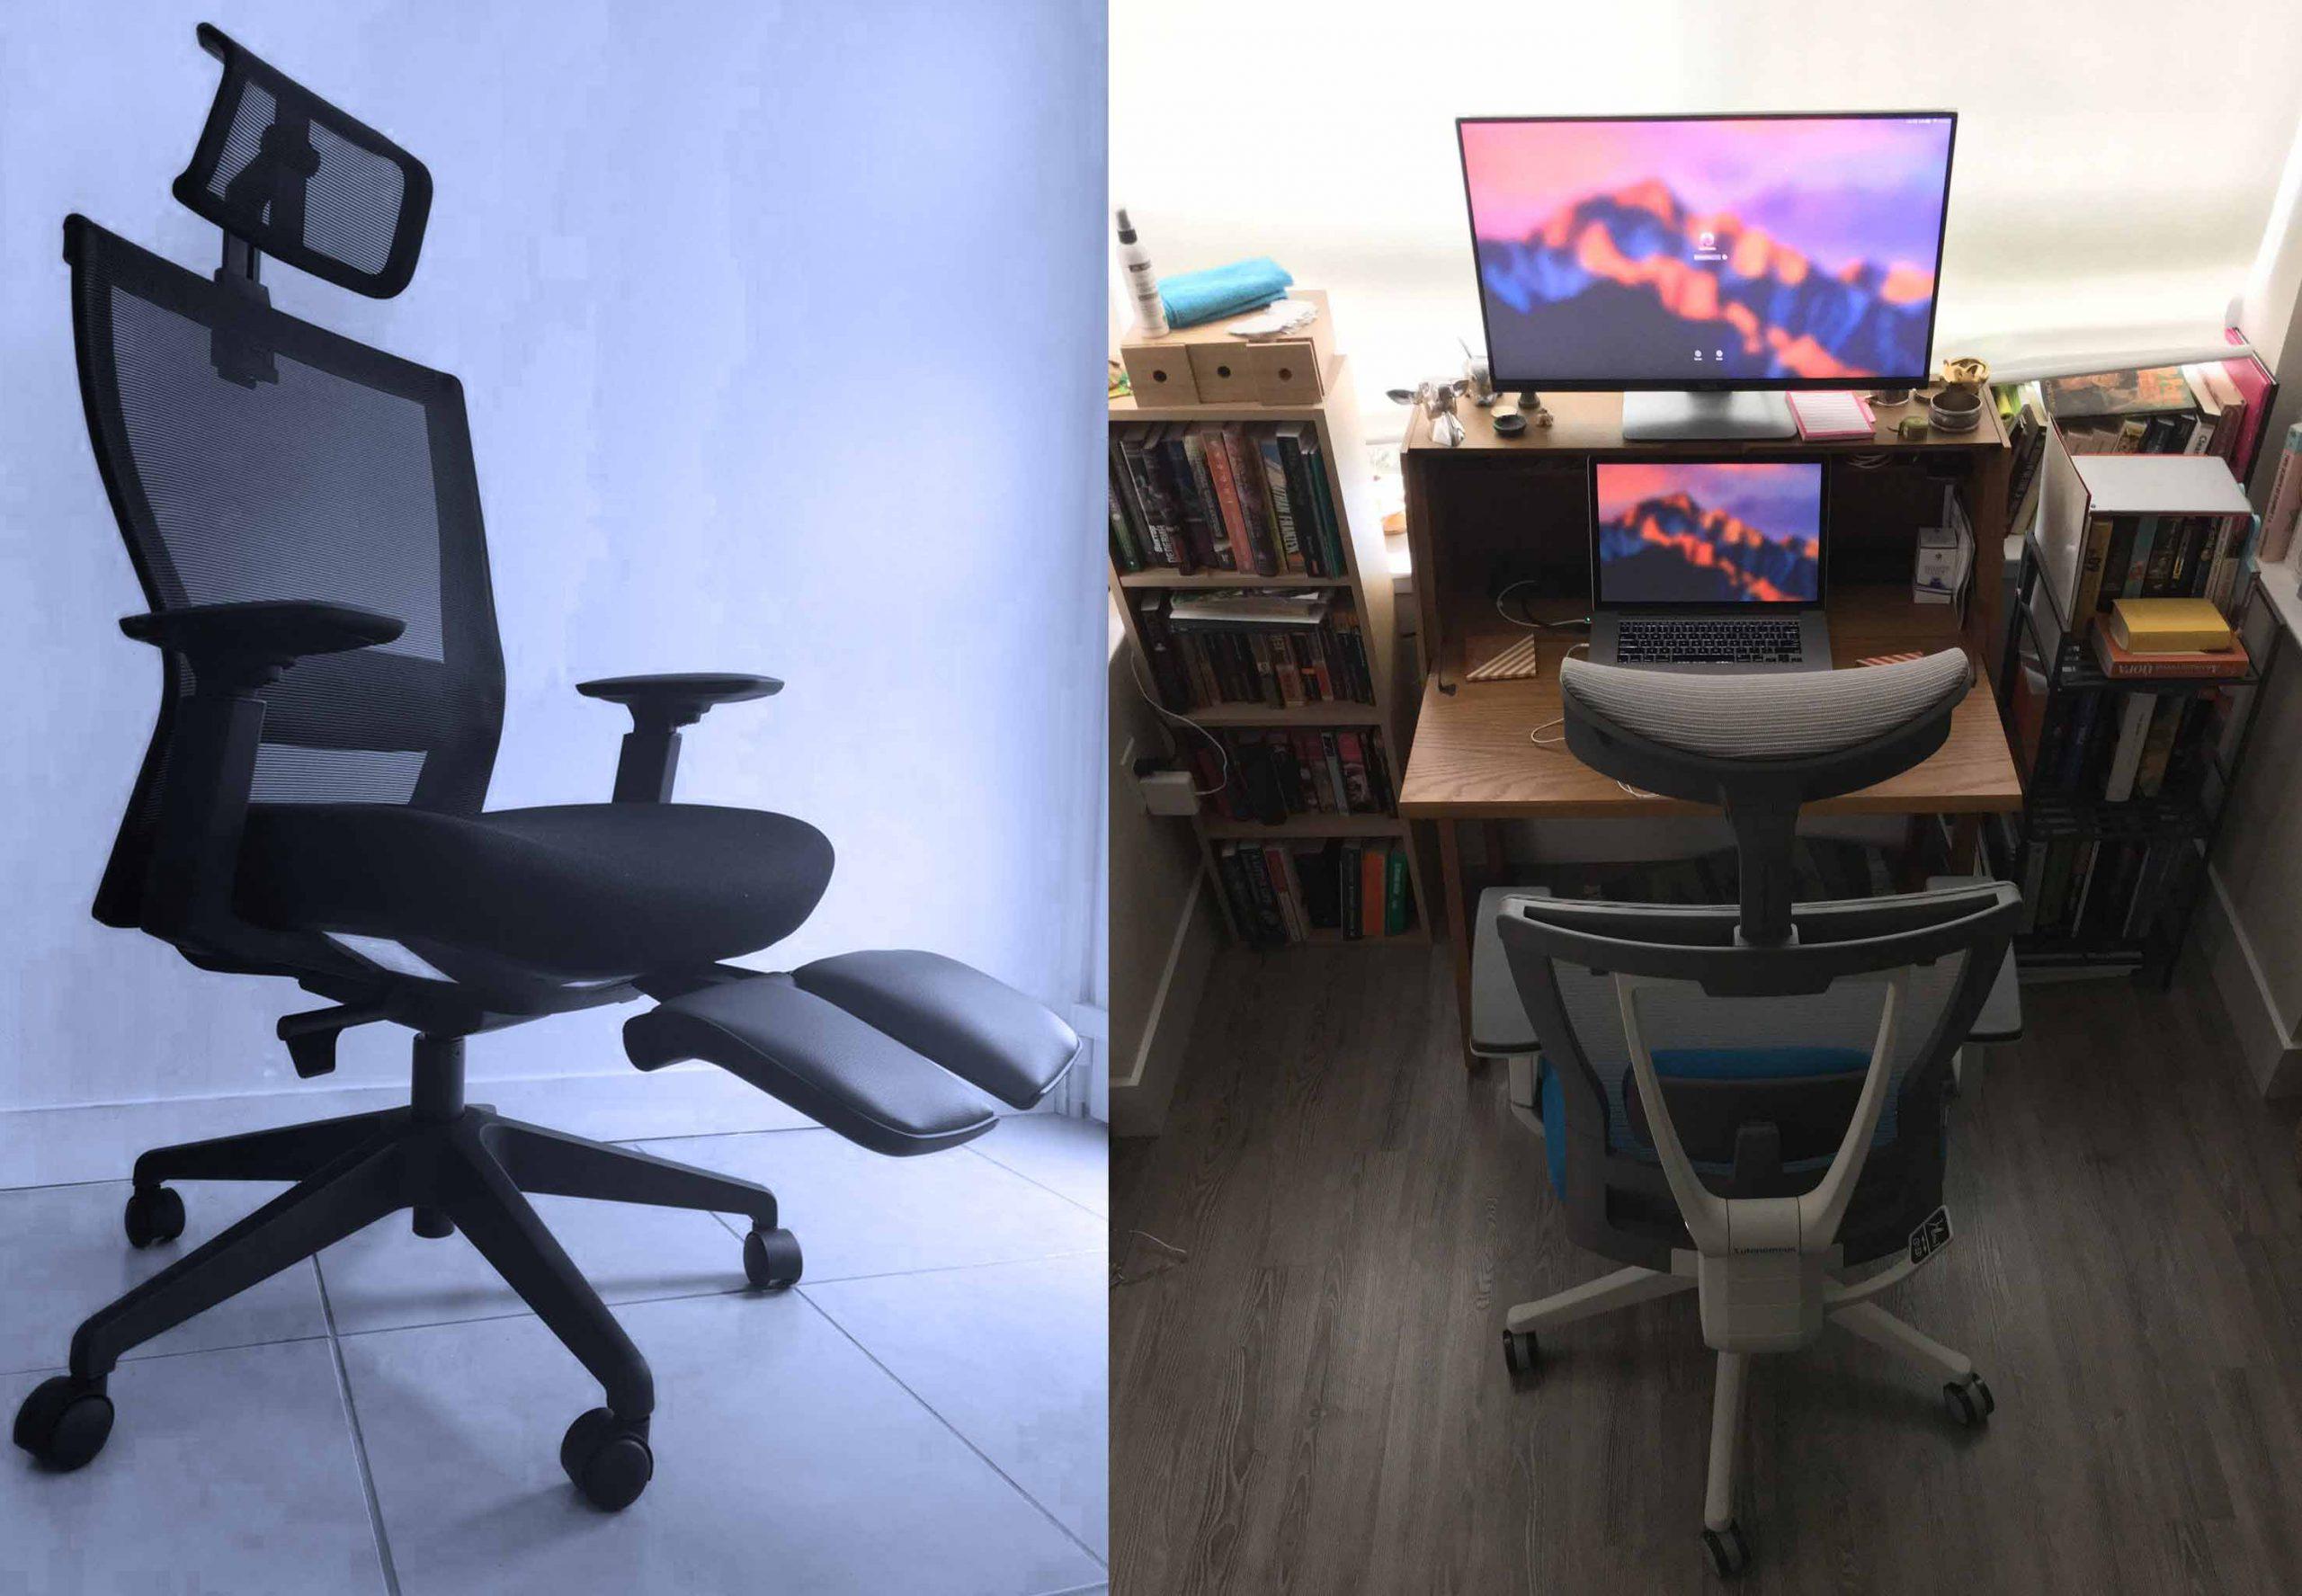 gaming chairs  - صندلی های بازی - تاریخچه-و-کاربرد-صندلی-های-گیمینگ-صندلی-گیمینگ-صندلی-بازی-Autonomous-ErgoChair-2-gaming-chair-1-